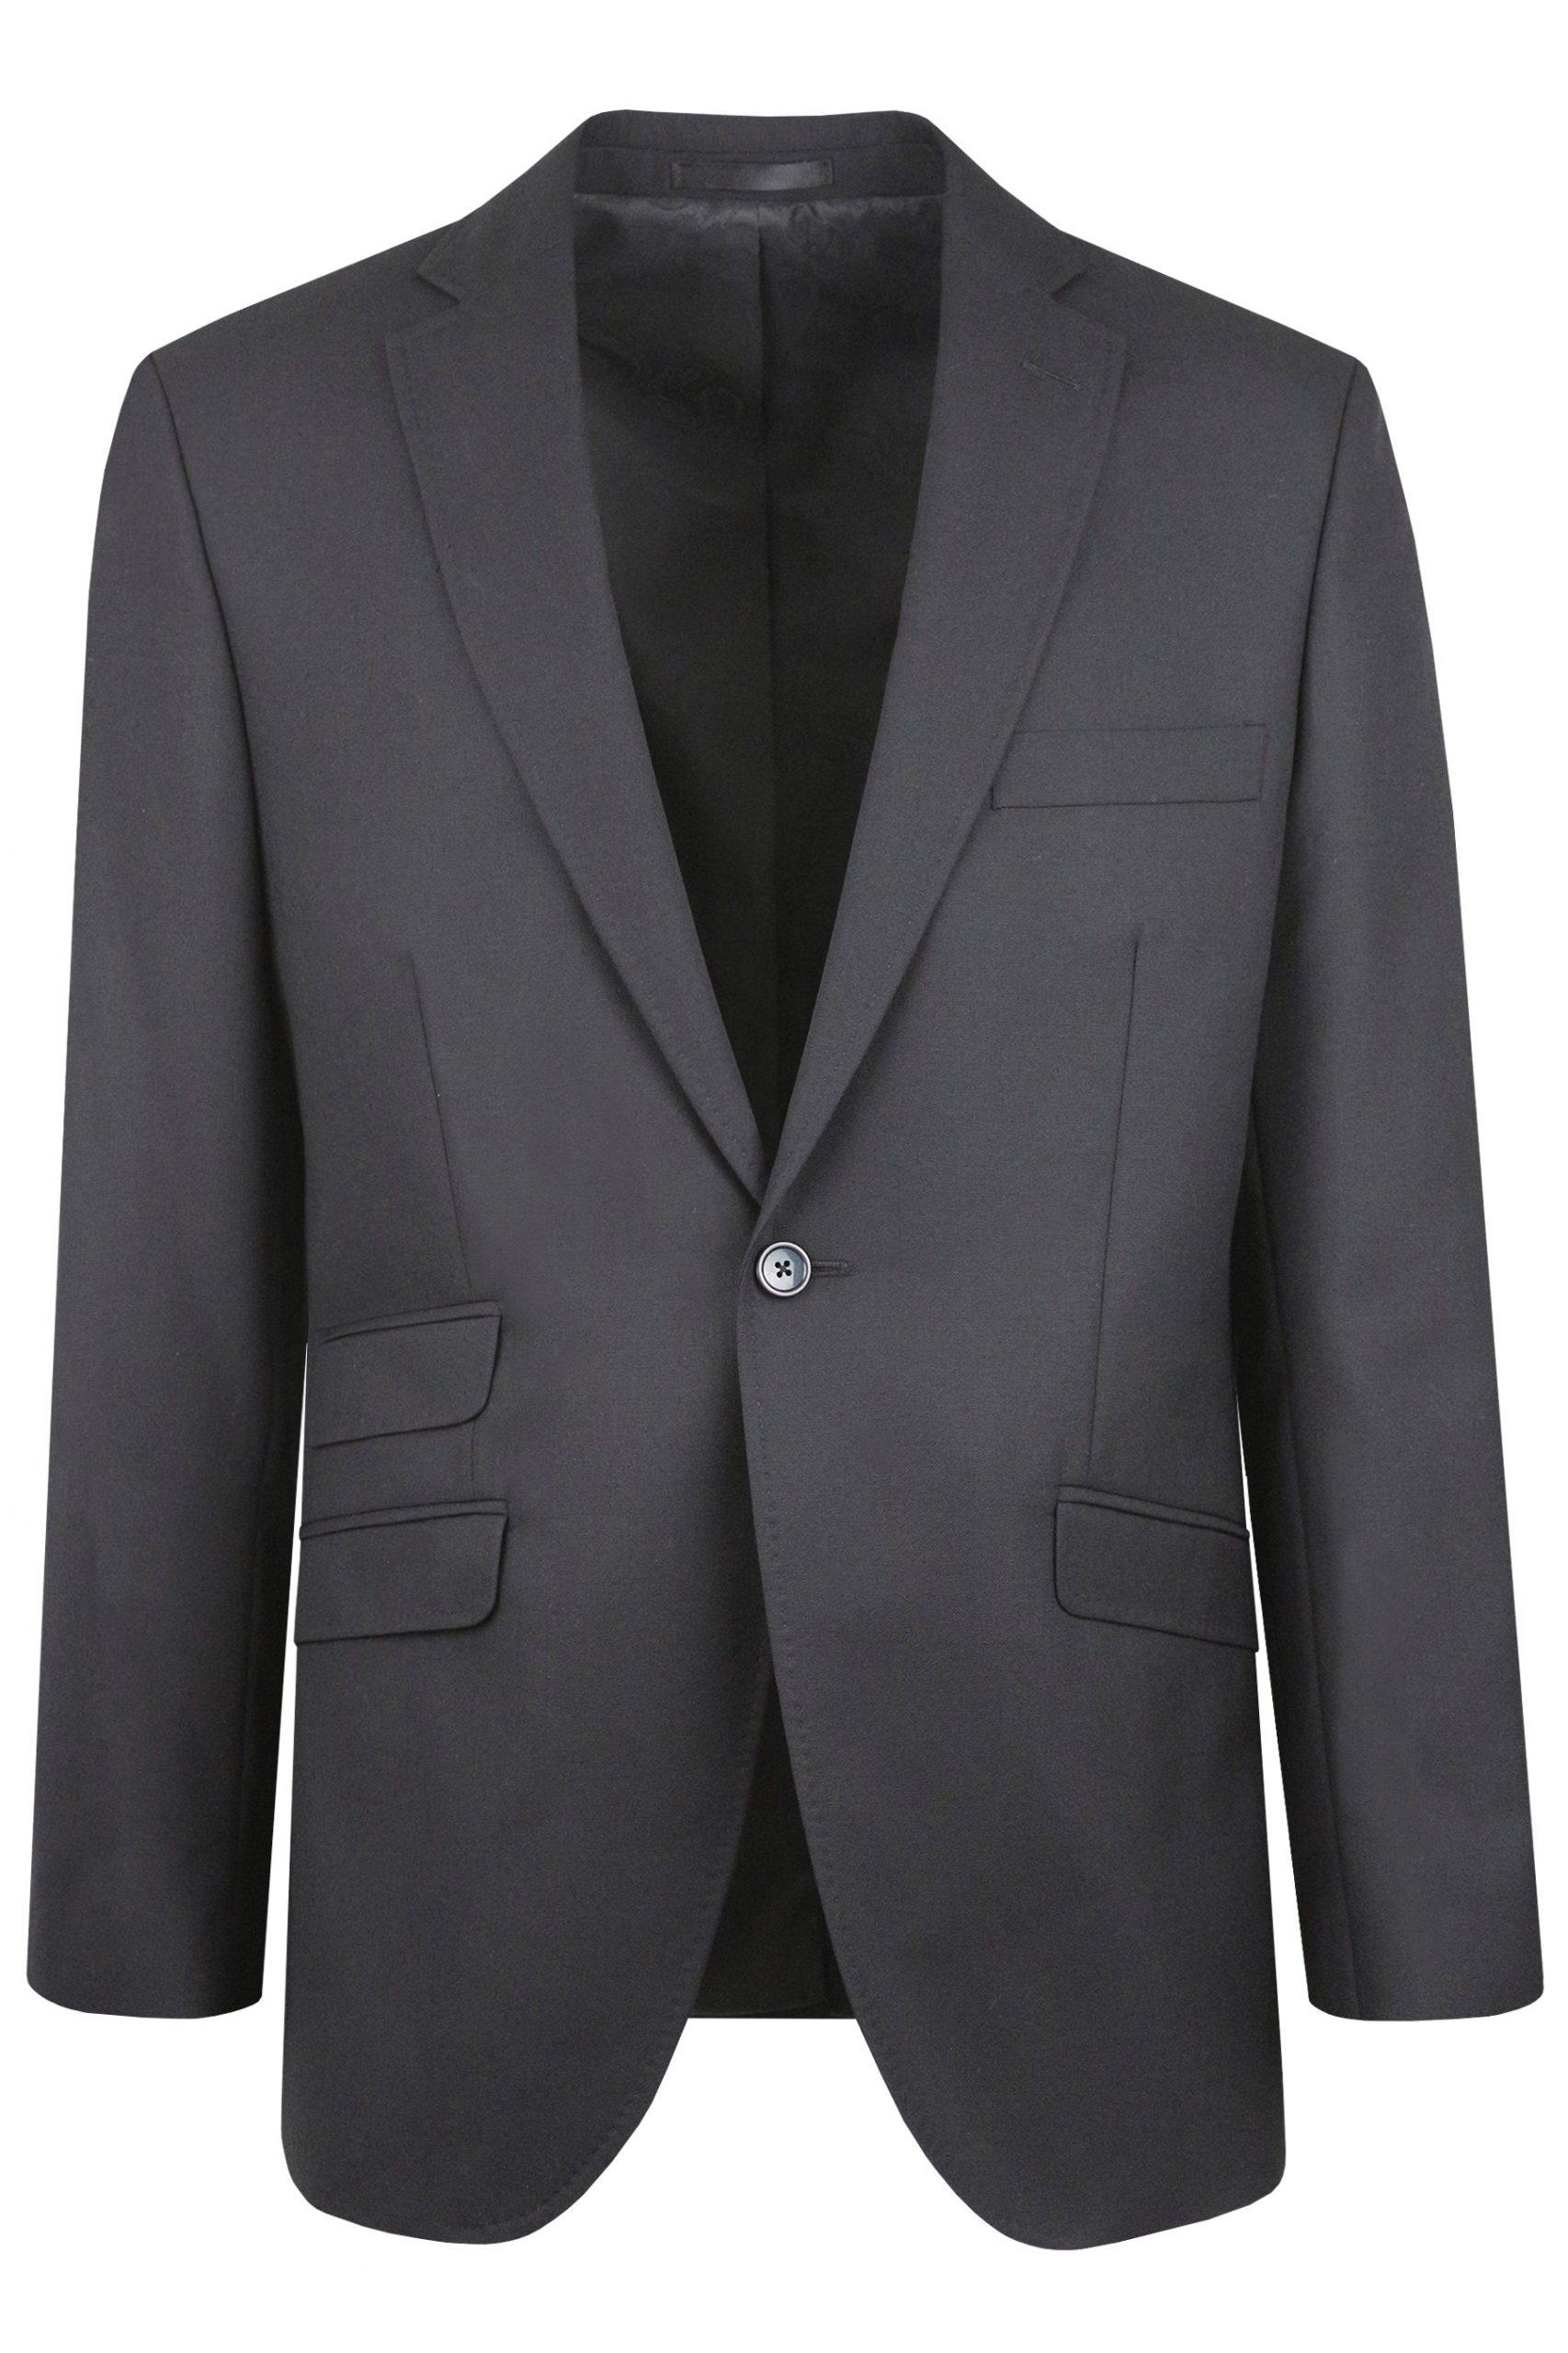 Black Wool Suit Jacket by a menswear hire company in Berkshire